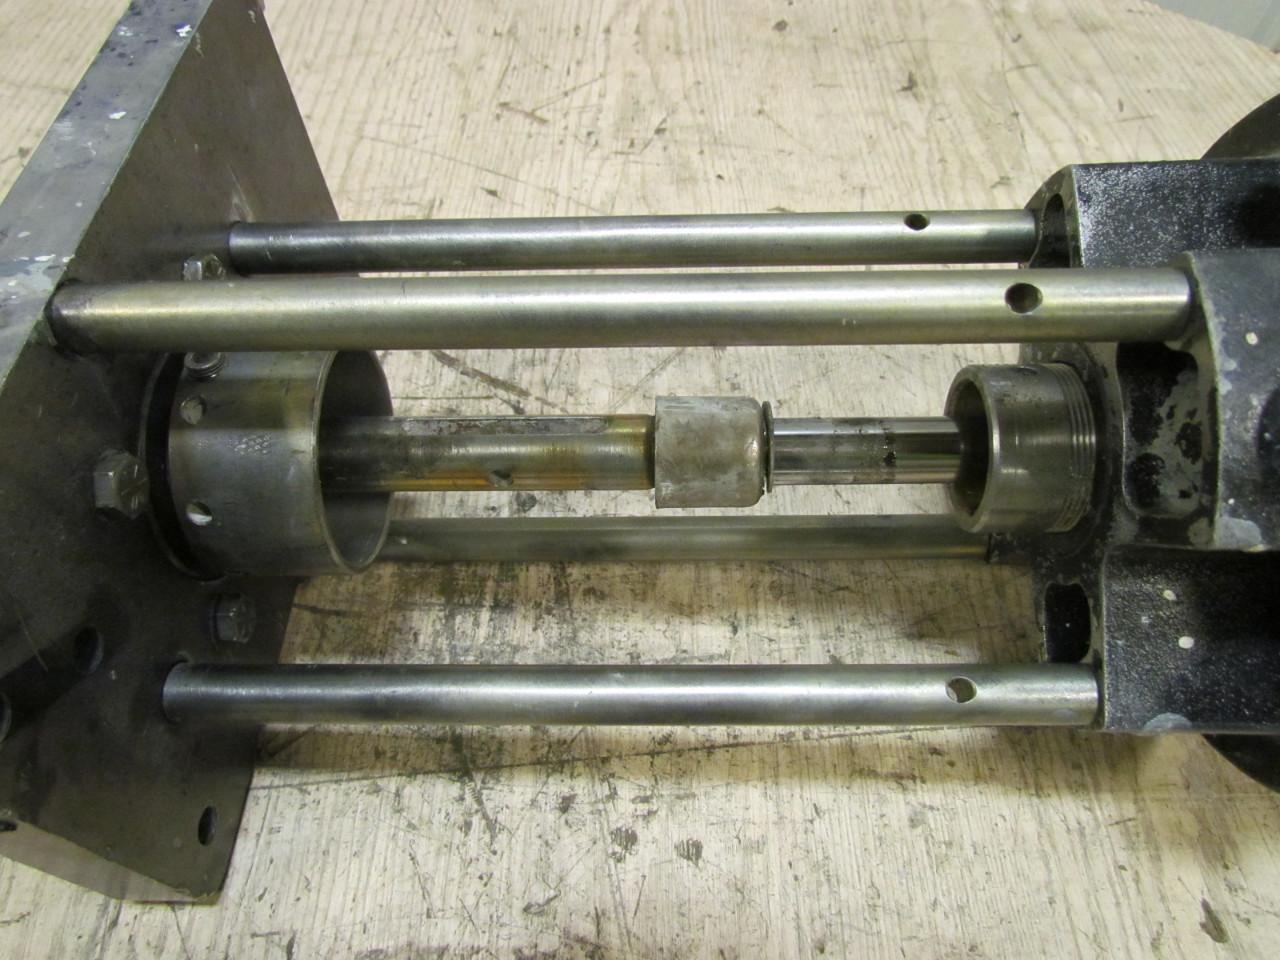 Aro 65651 2 Ball Pump 9to1 Ratio 6 Air Motor 2 Pump 810